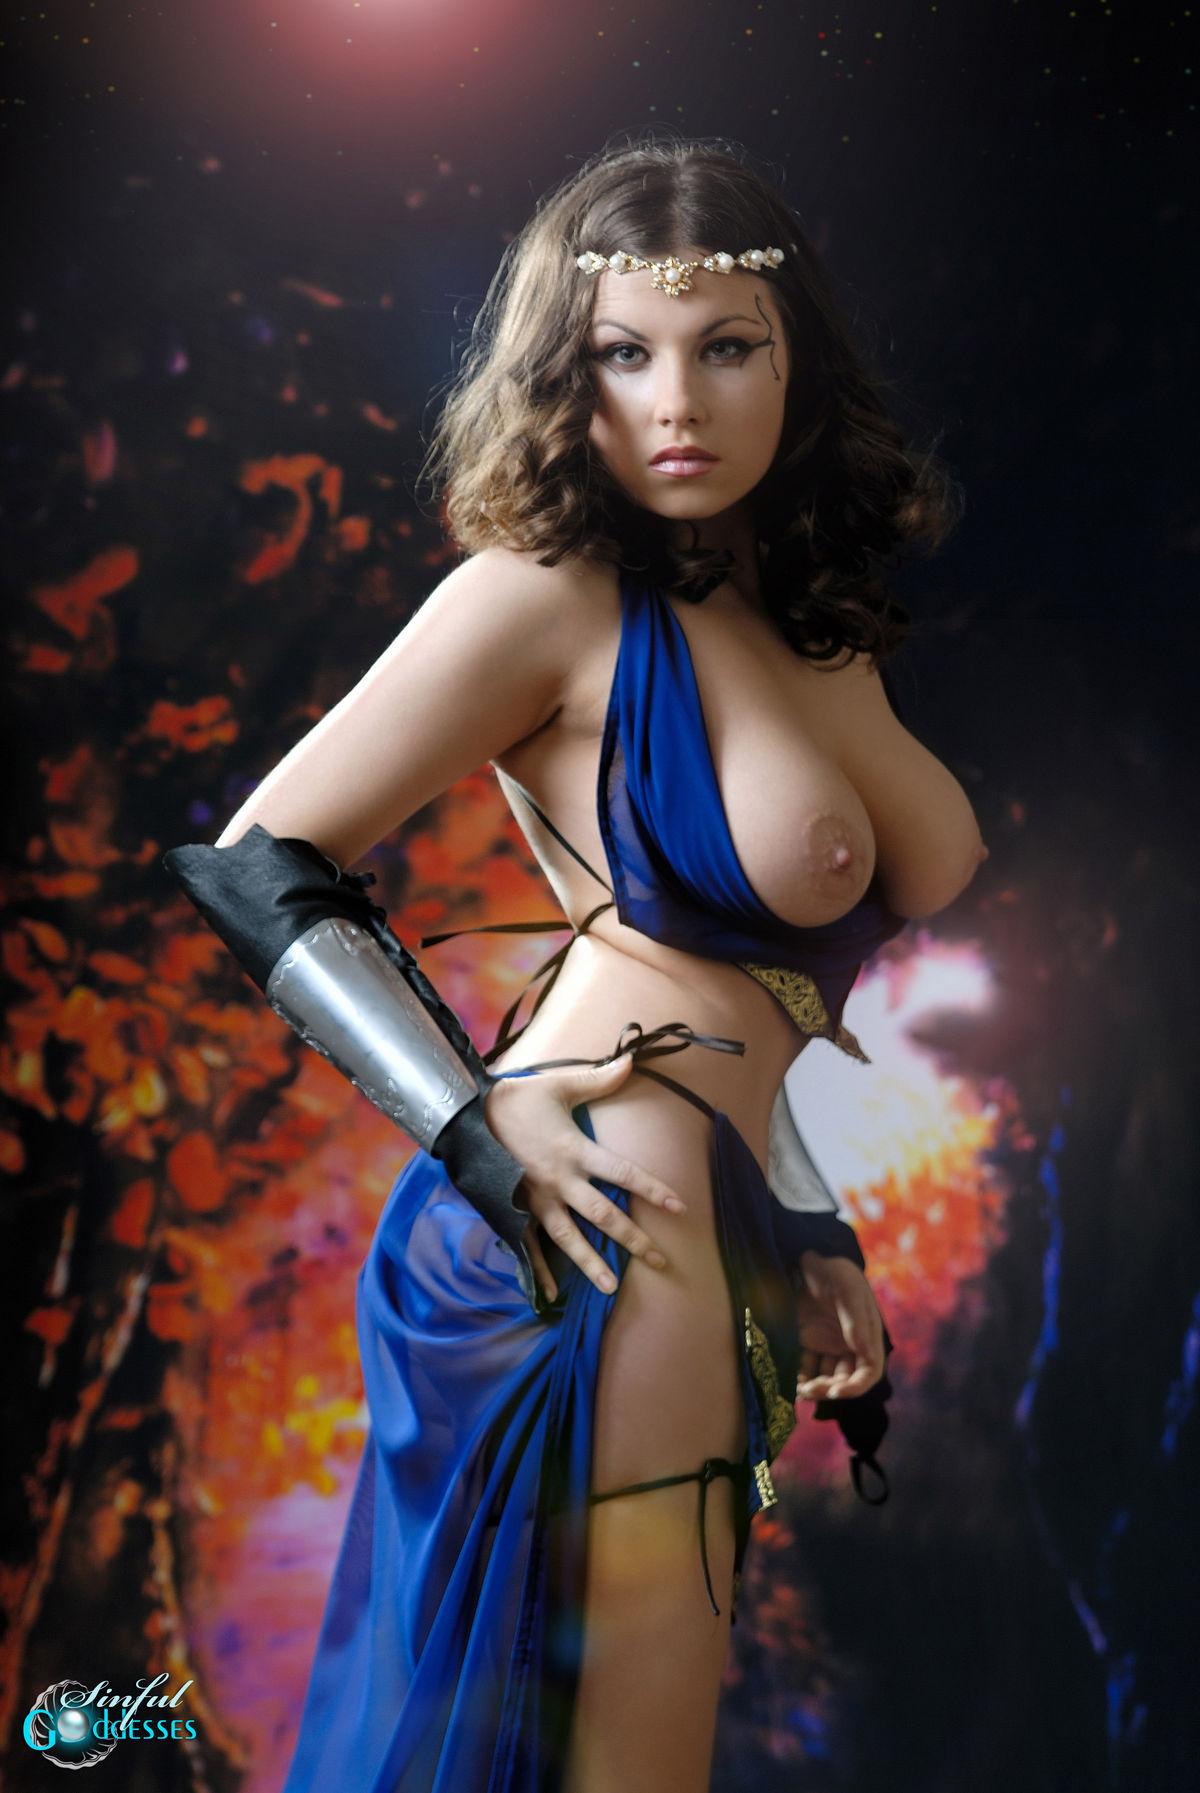 Egypt girl beautiful tit dance - 2 part 8